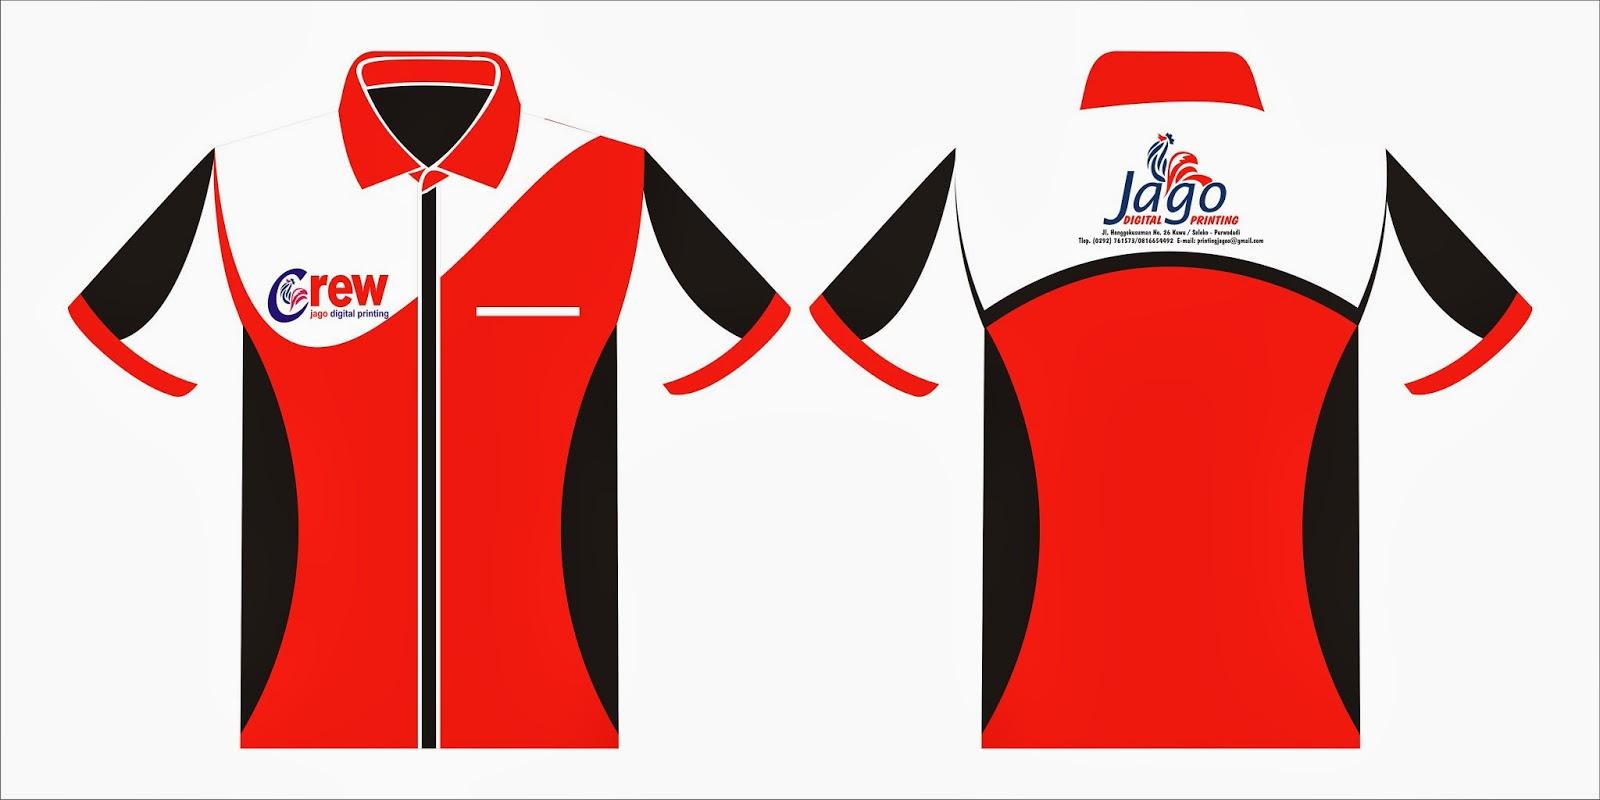 Design Seragam Jago